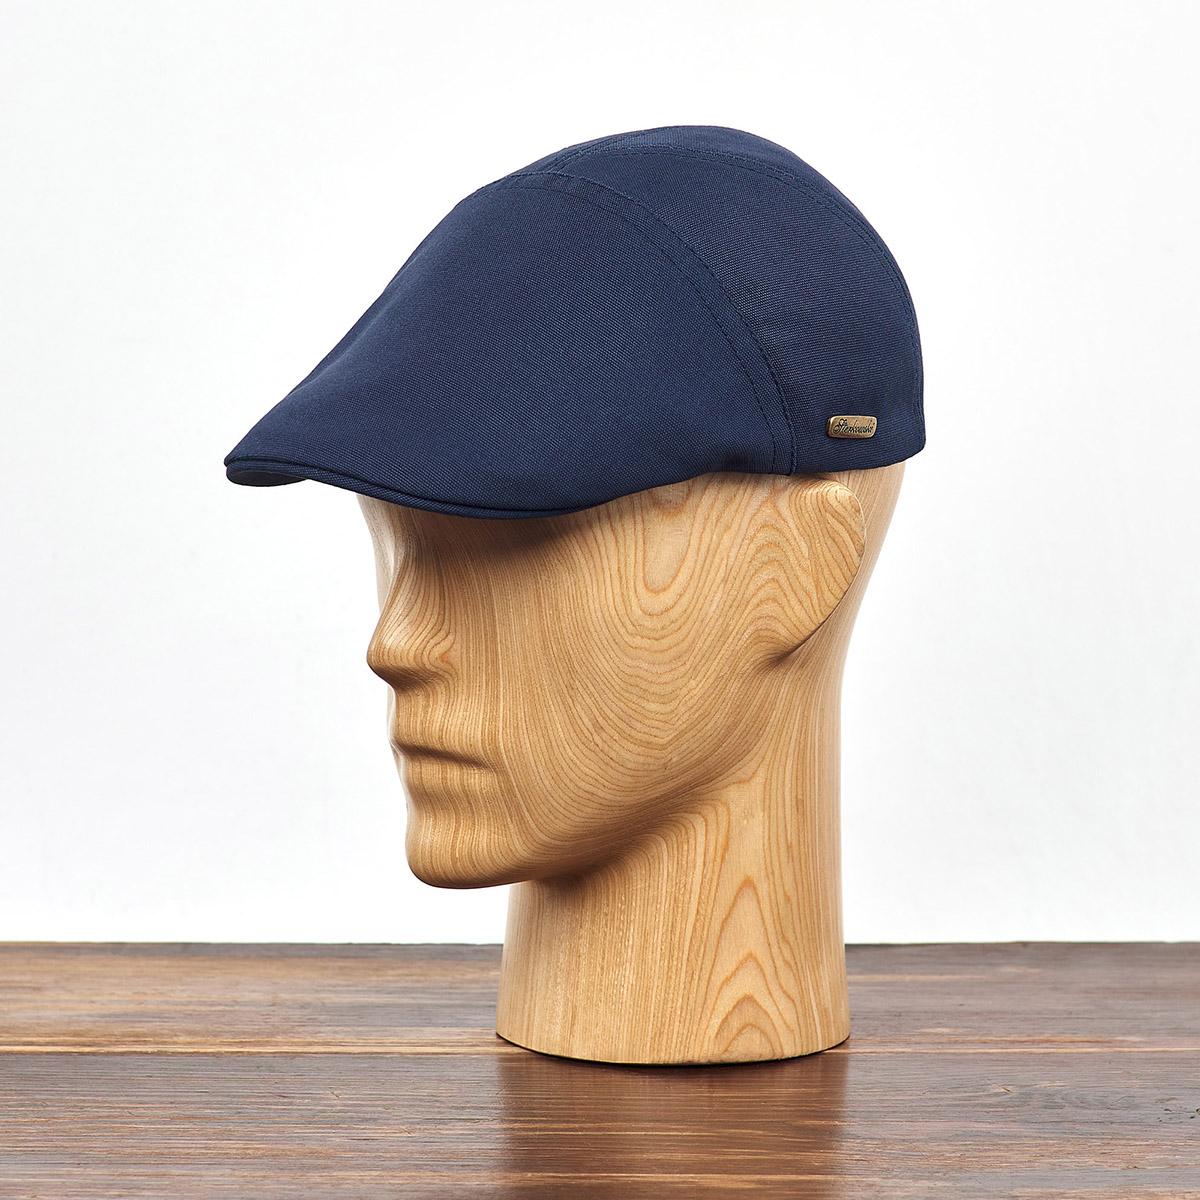 5 panels crown vergon jeff cap spring mens cotton cheese-cutter hat